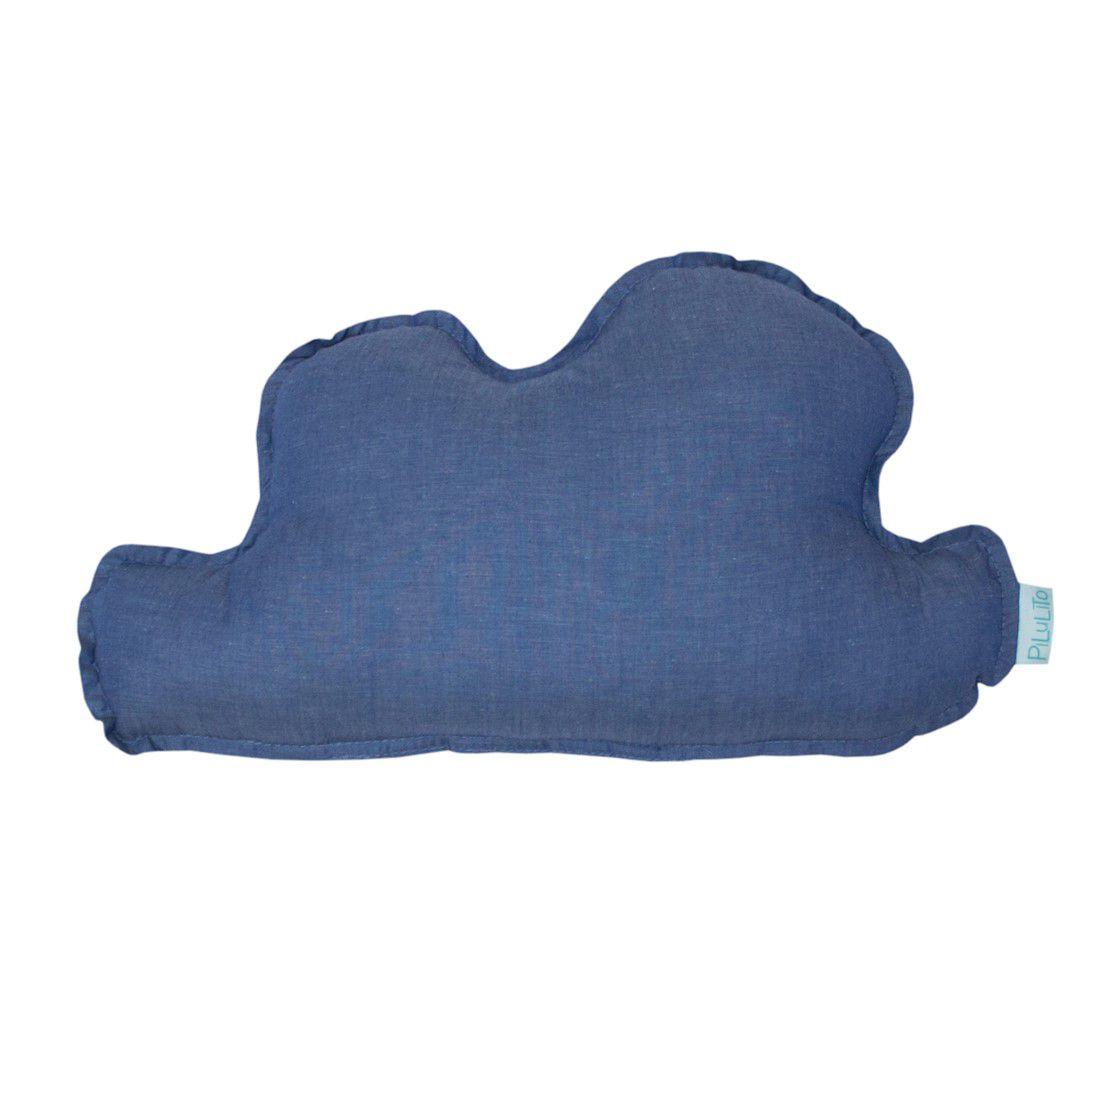 Almofada nuvem pequena  azul jeans